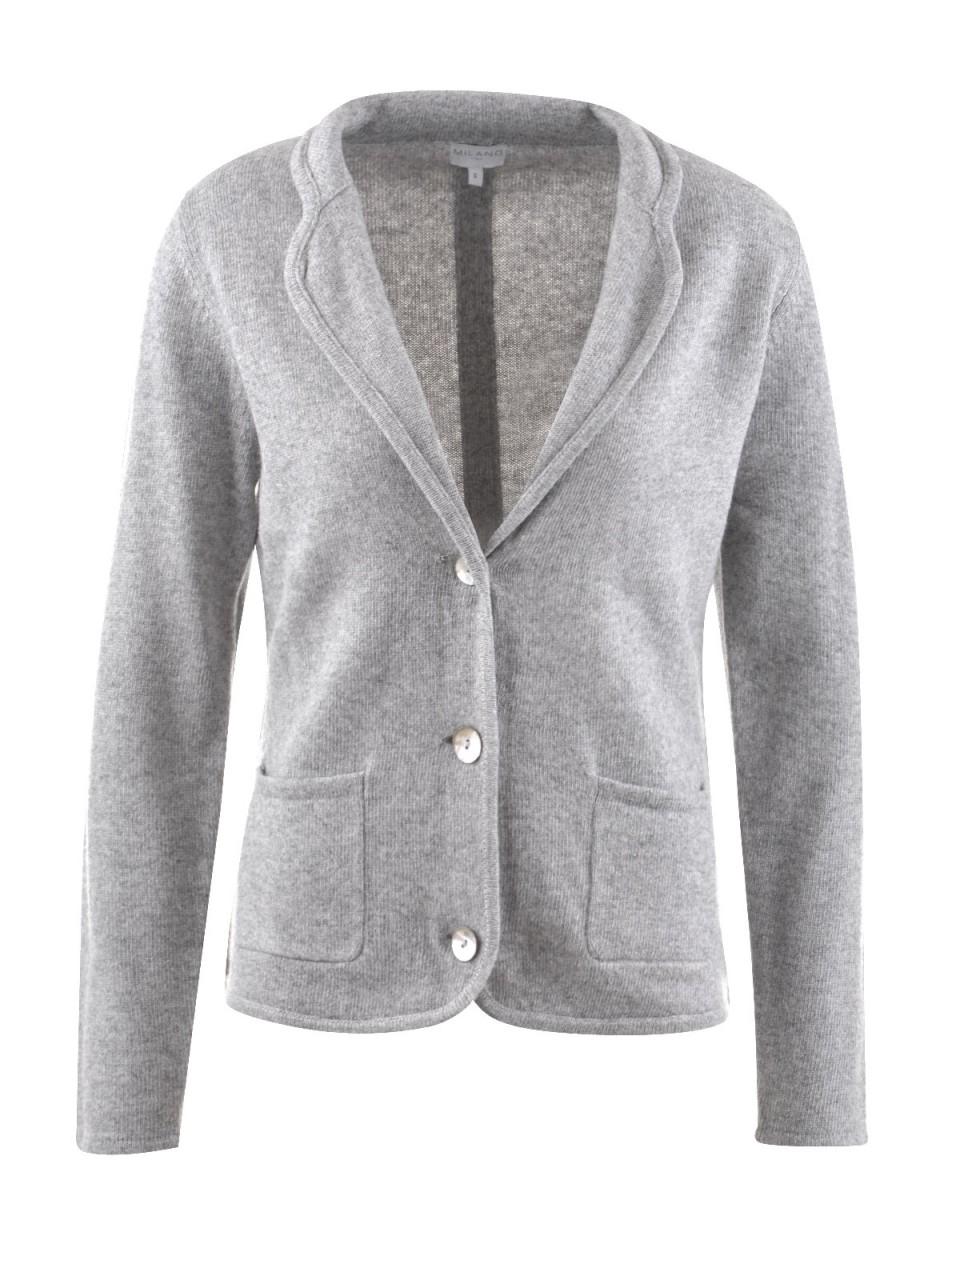 Jacken - MILANO ITALY Damen Strickjacke, grau  - Onlineshop Designermode.com